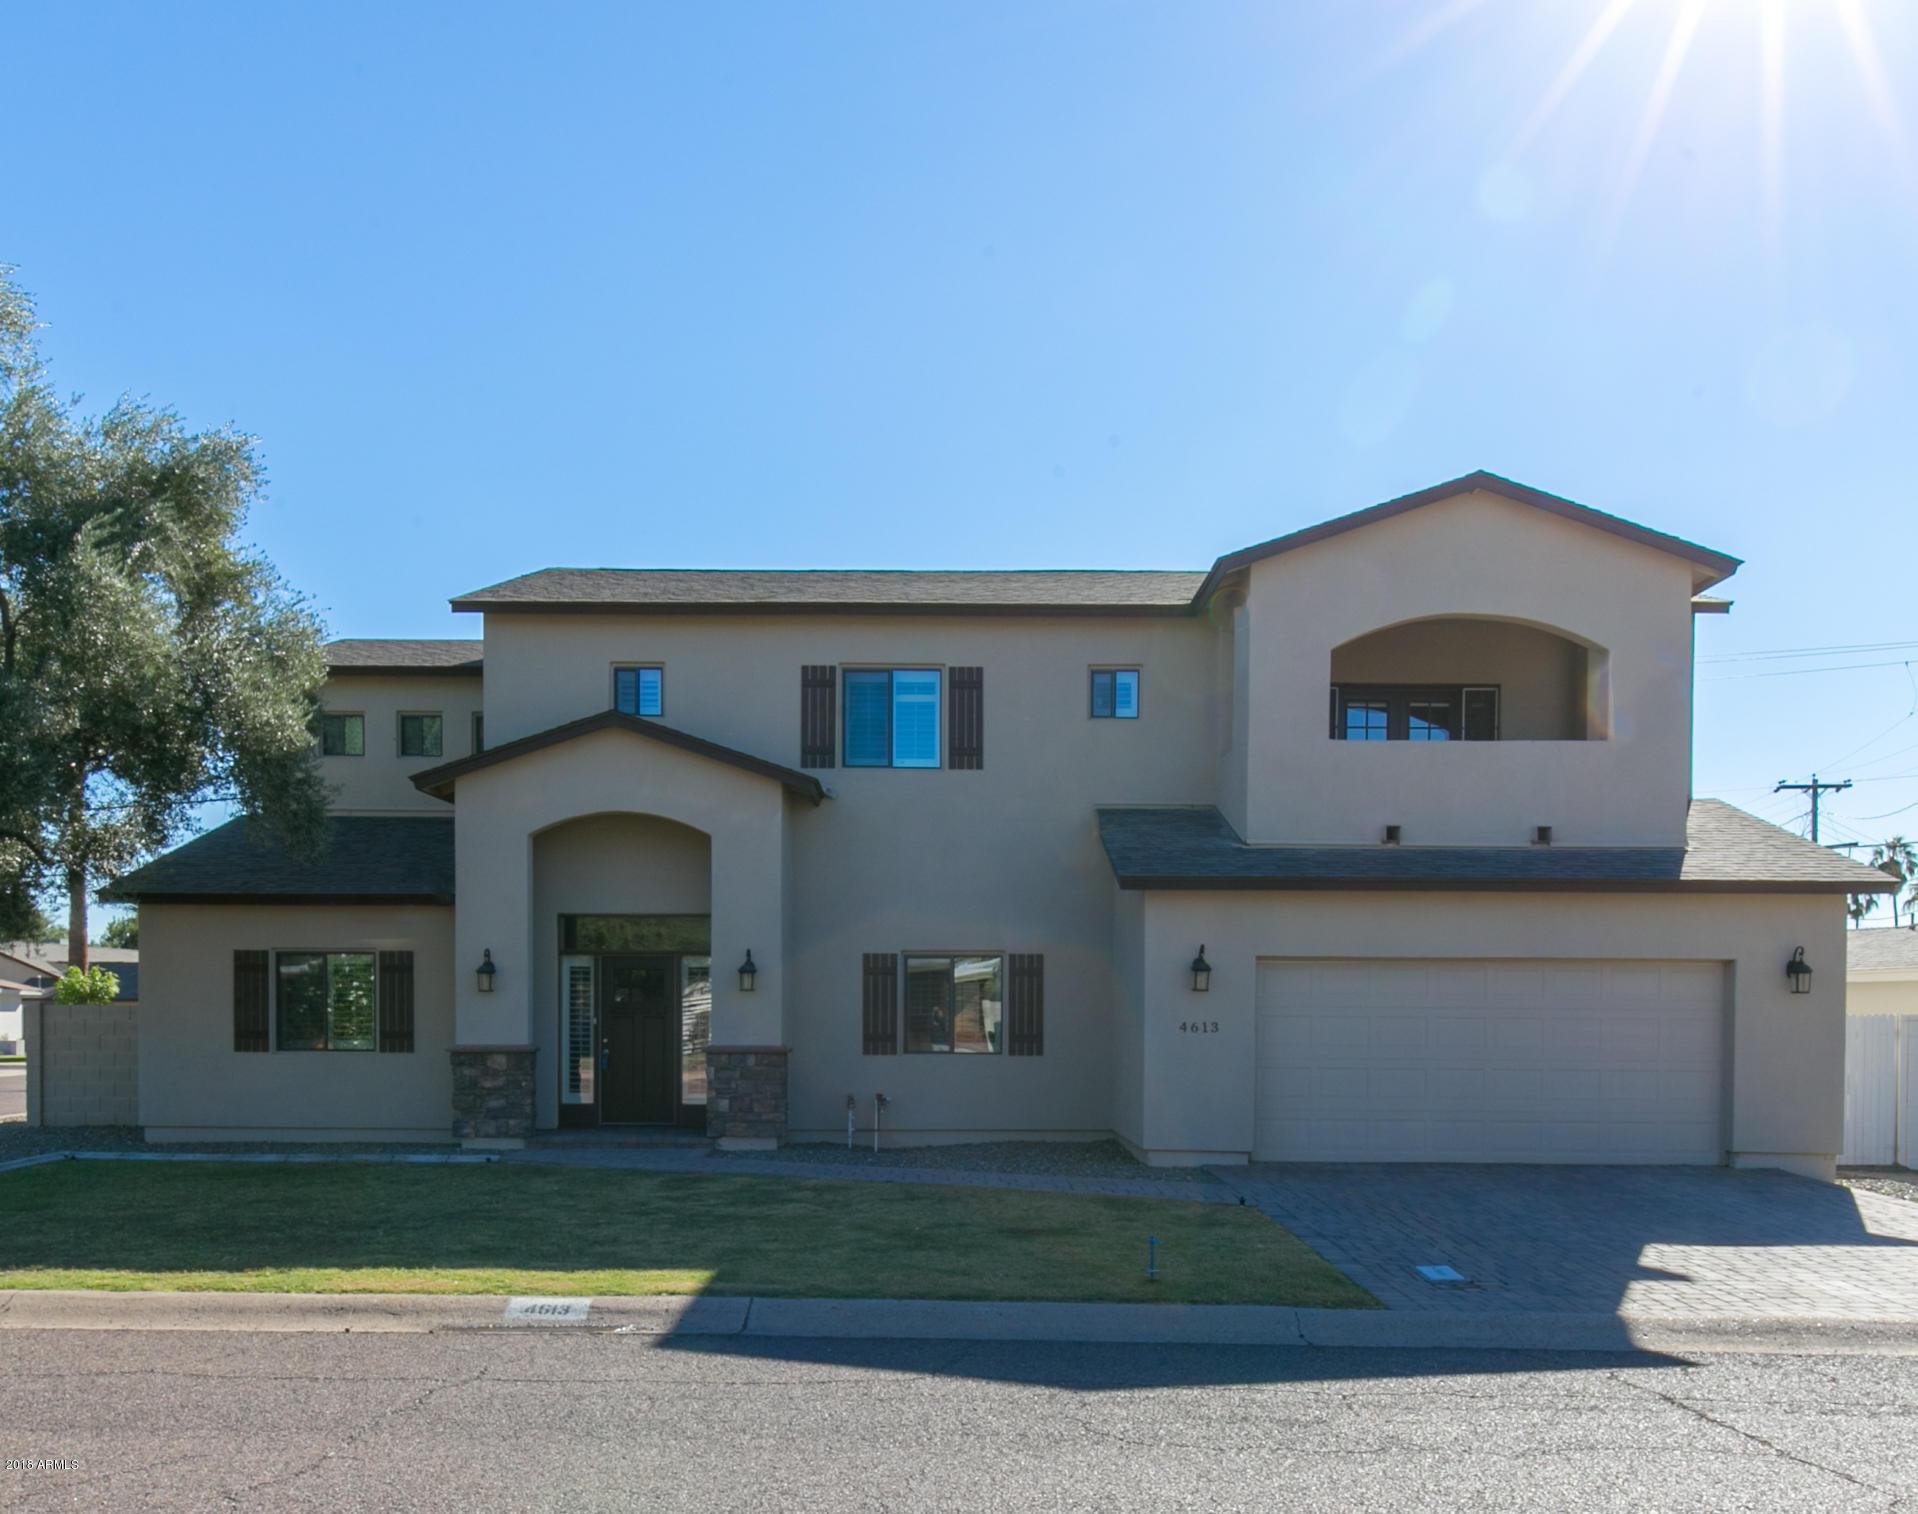 4613 E DEVONSHIRE Avenue, Phoenix AZ 85018